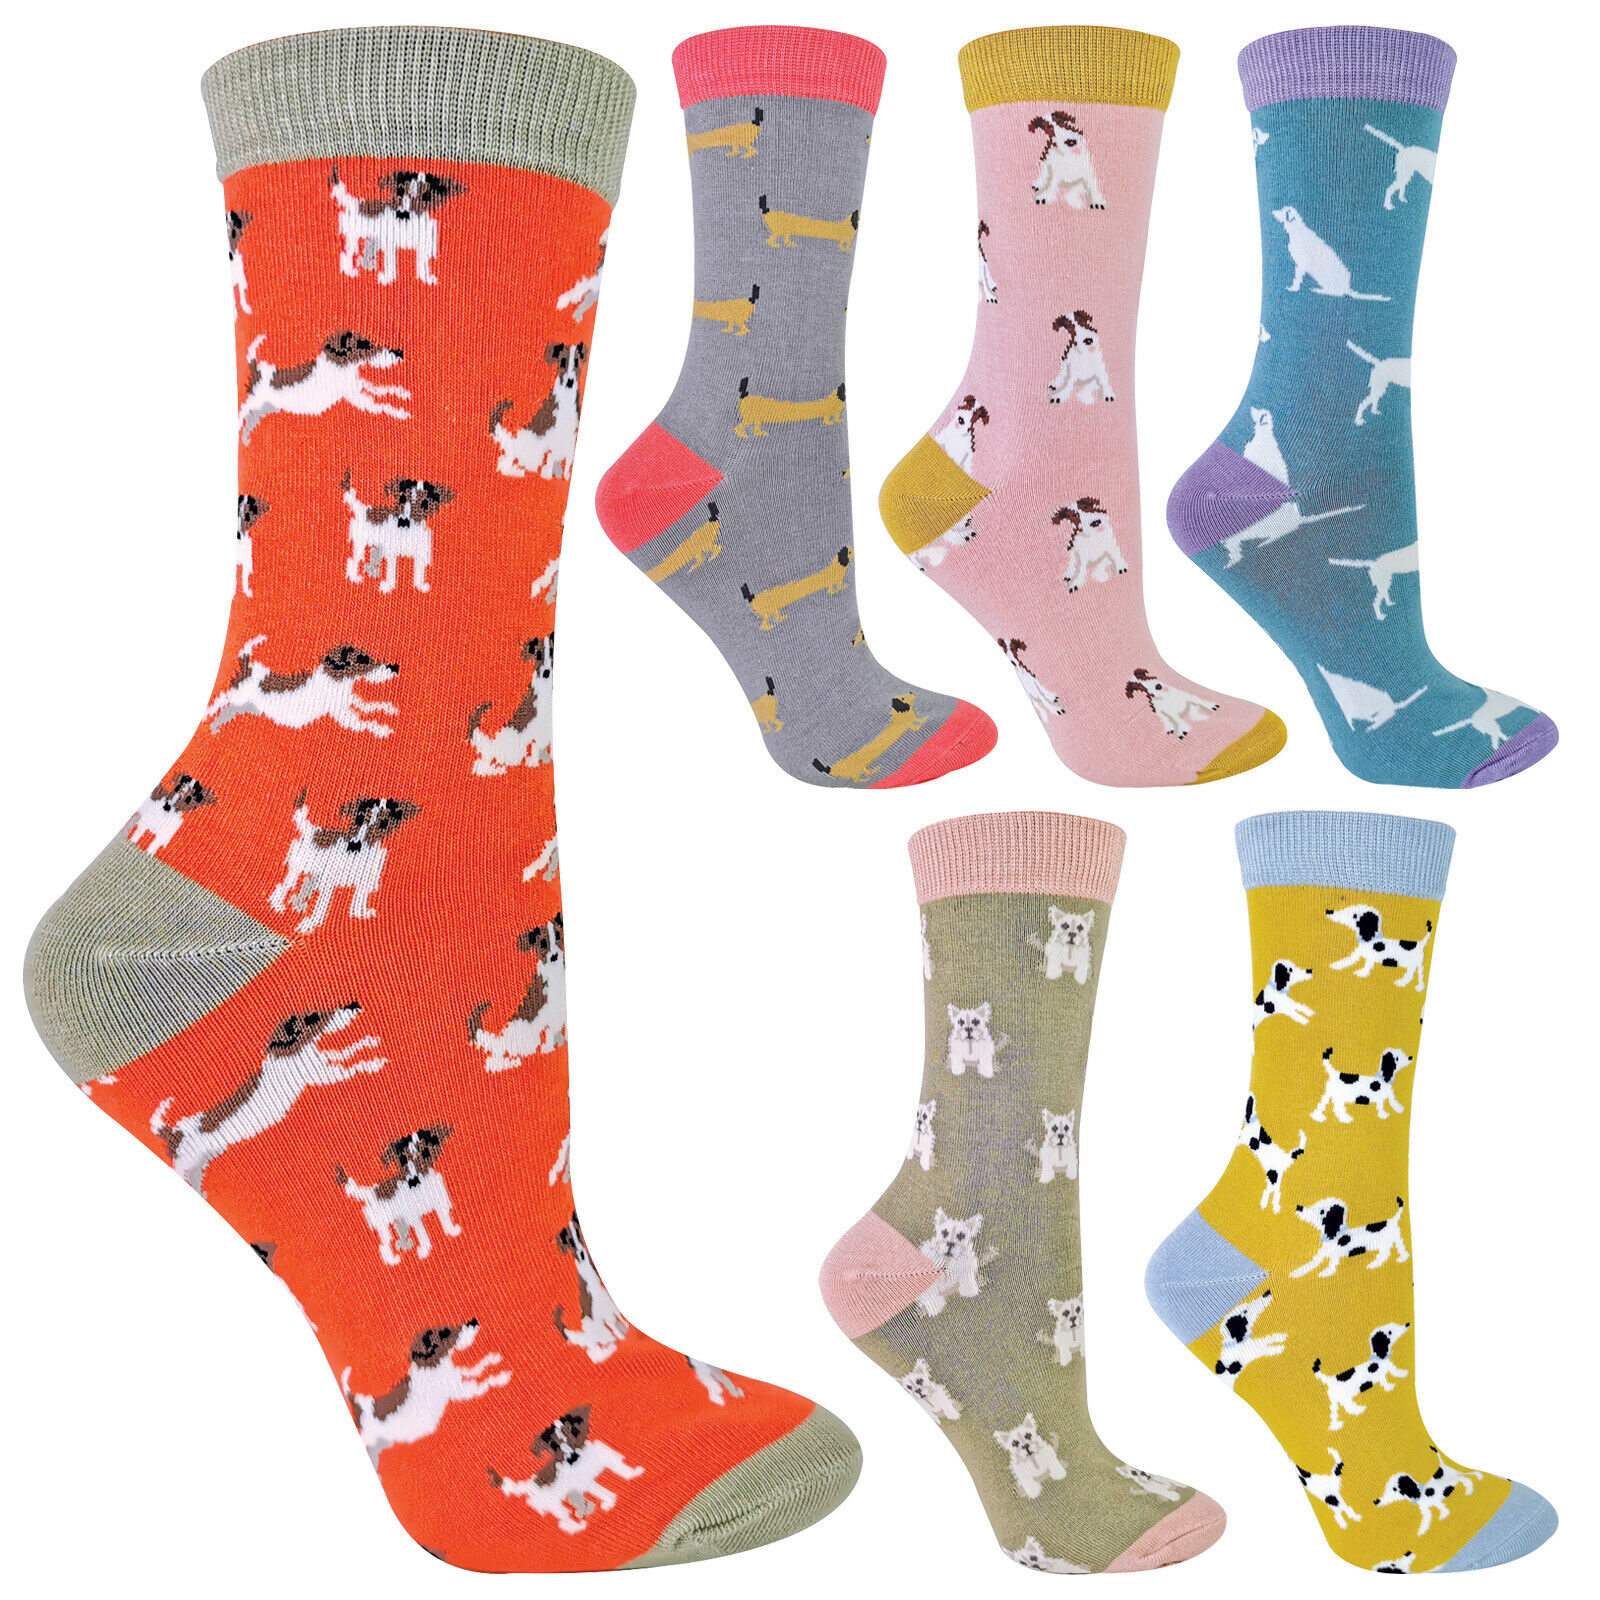 MISS SPARROW - Damen Socken mit Tieremotiv Bambus Socken mit Bunt Animal Muster